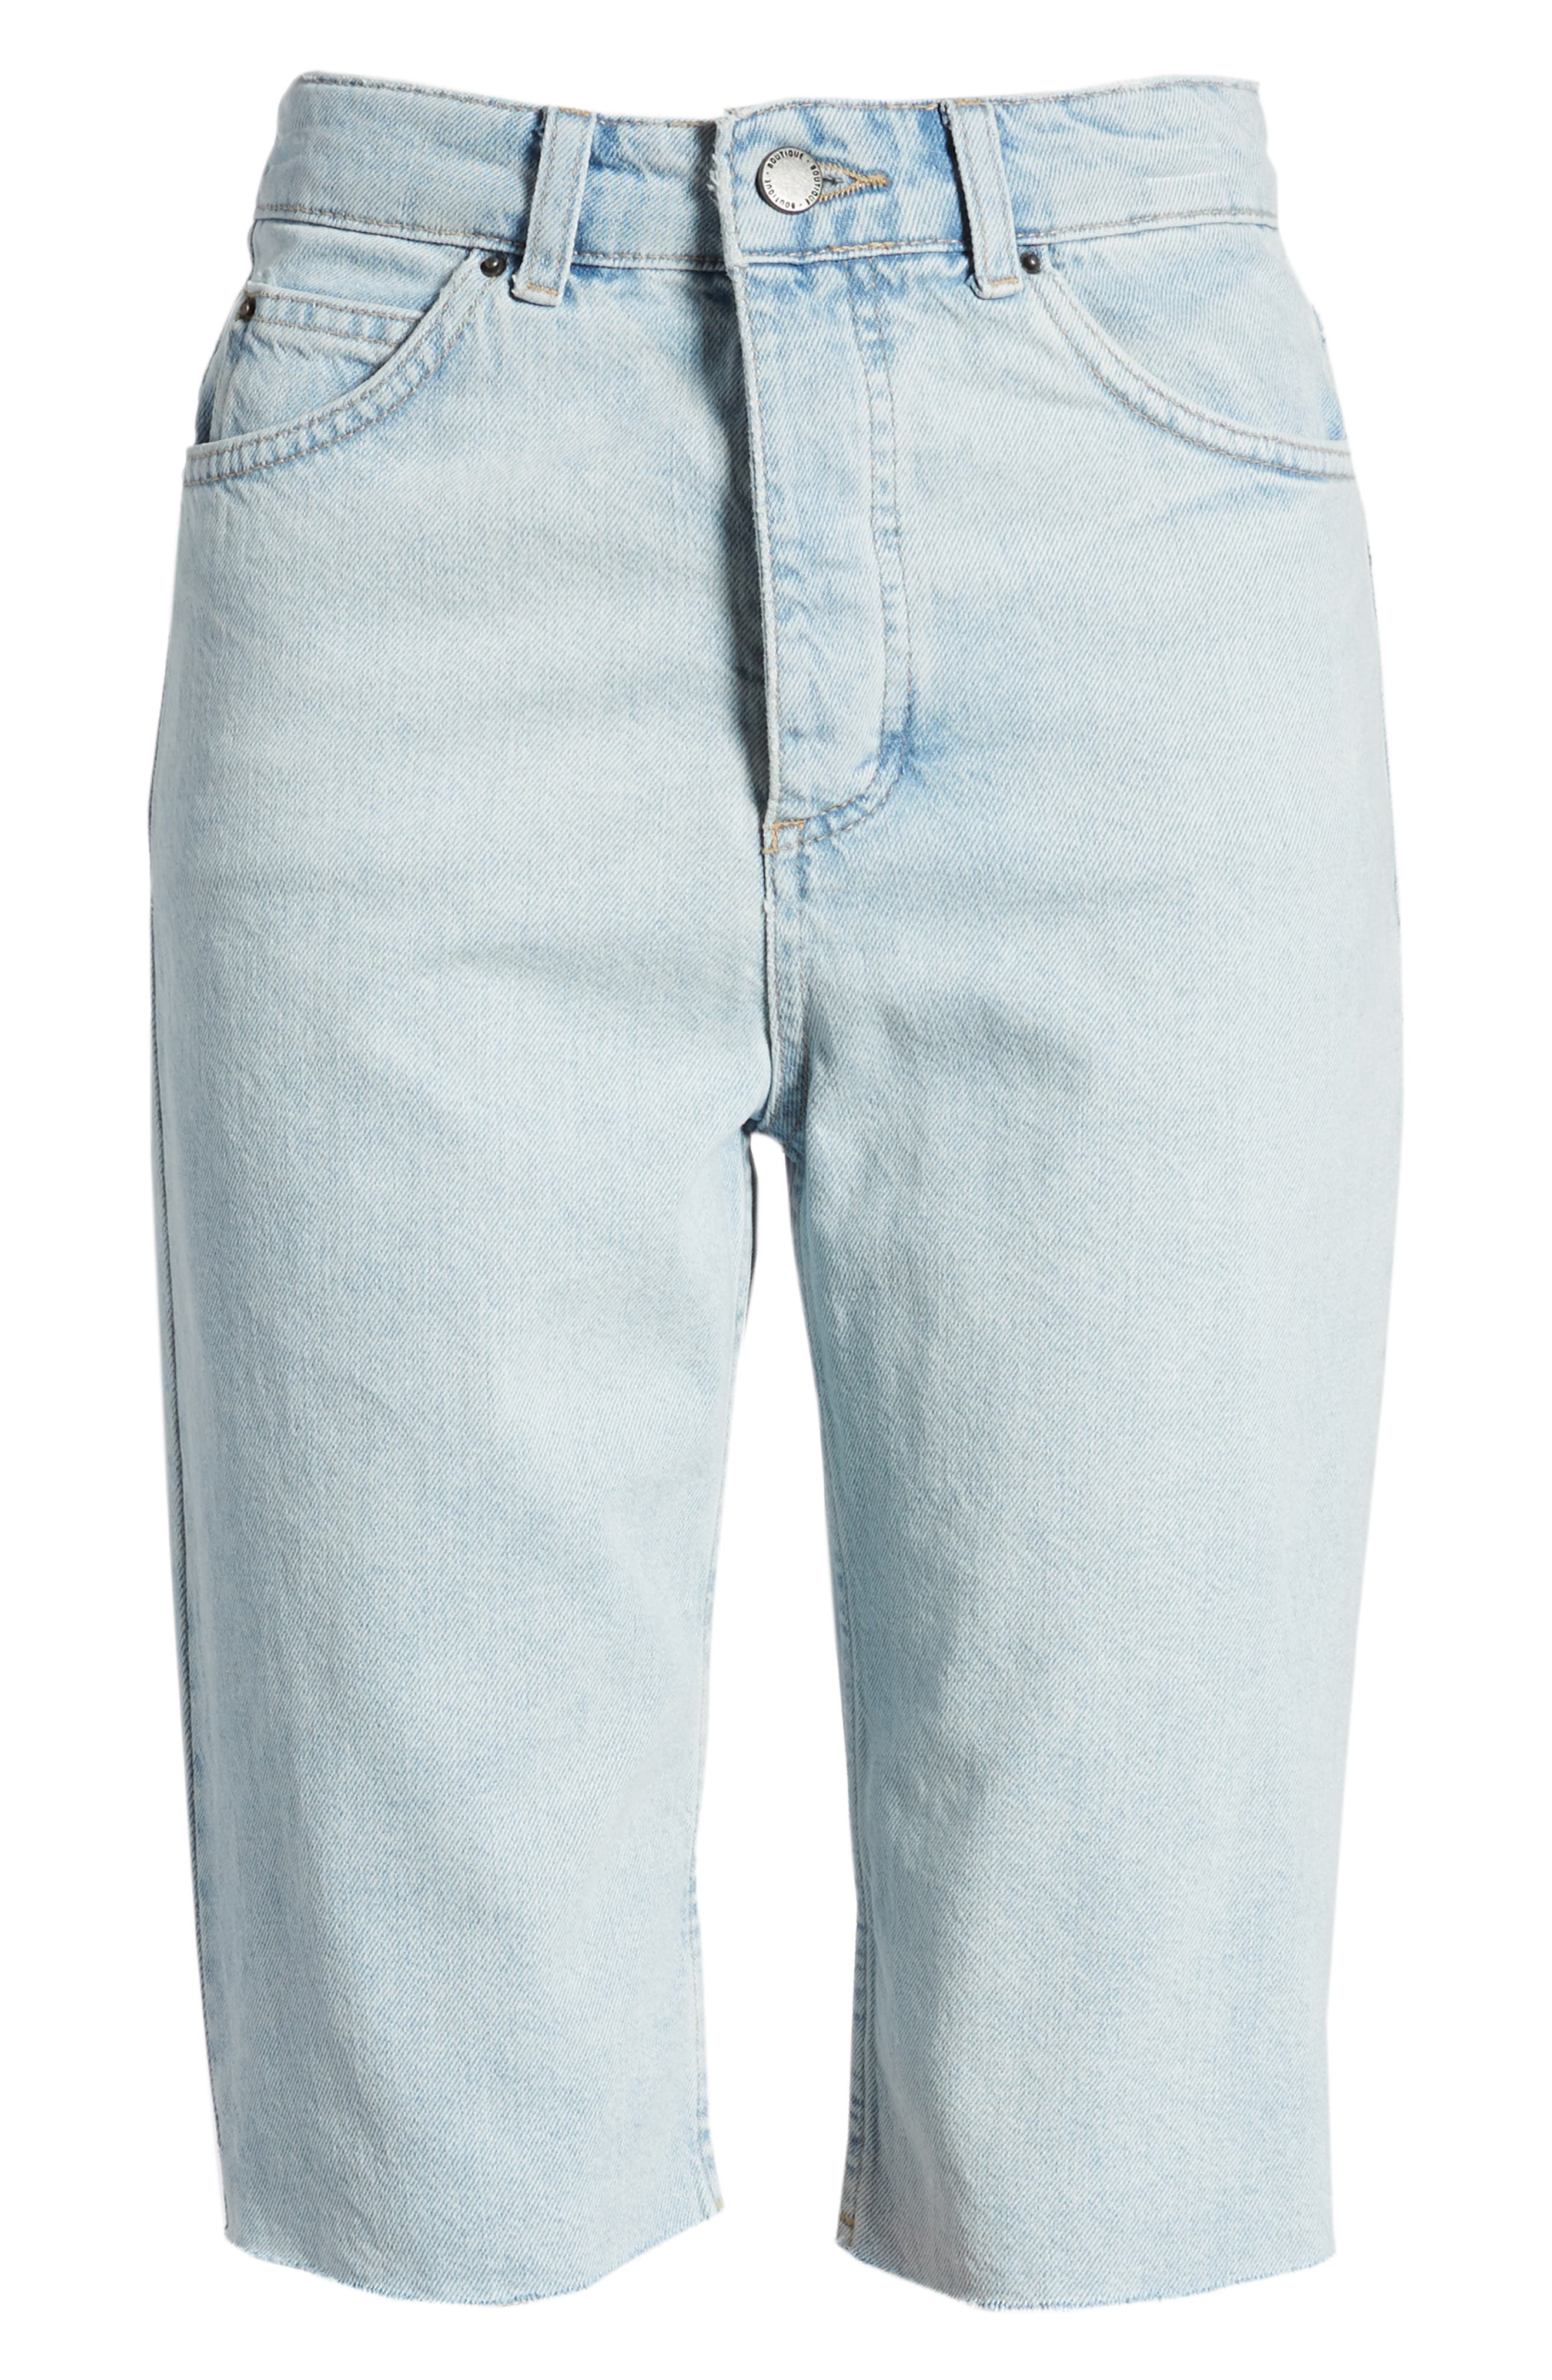 Bleach Denim Board Shorts,                             Alternate thumbnail 7, color,                             420